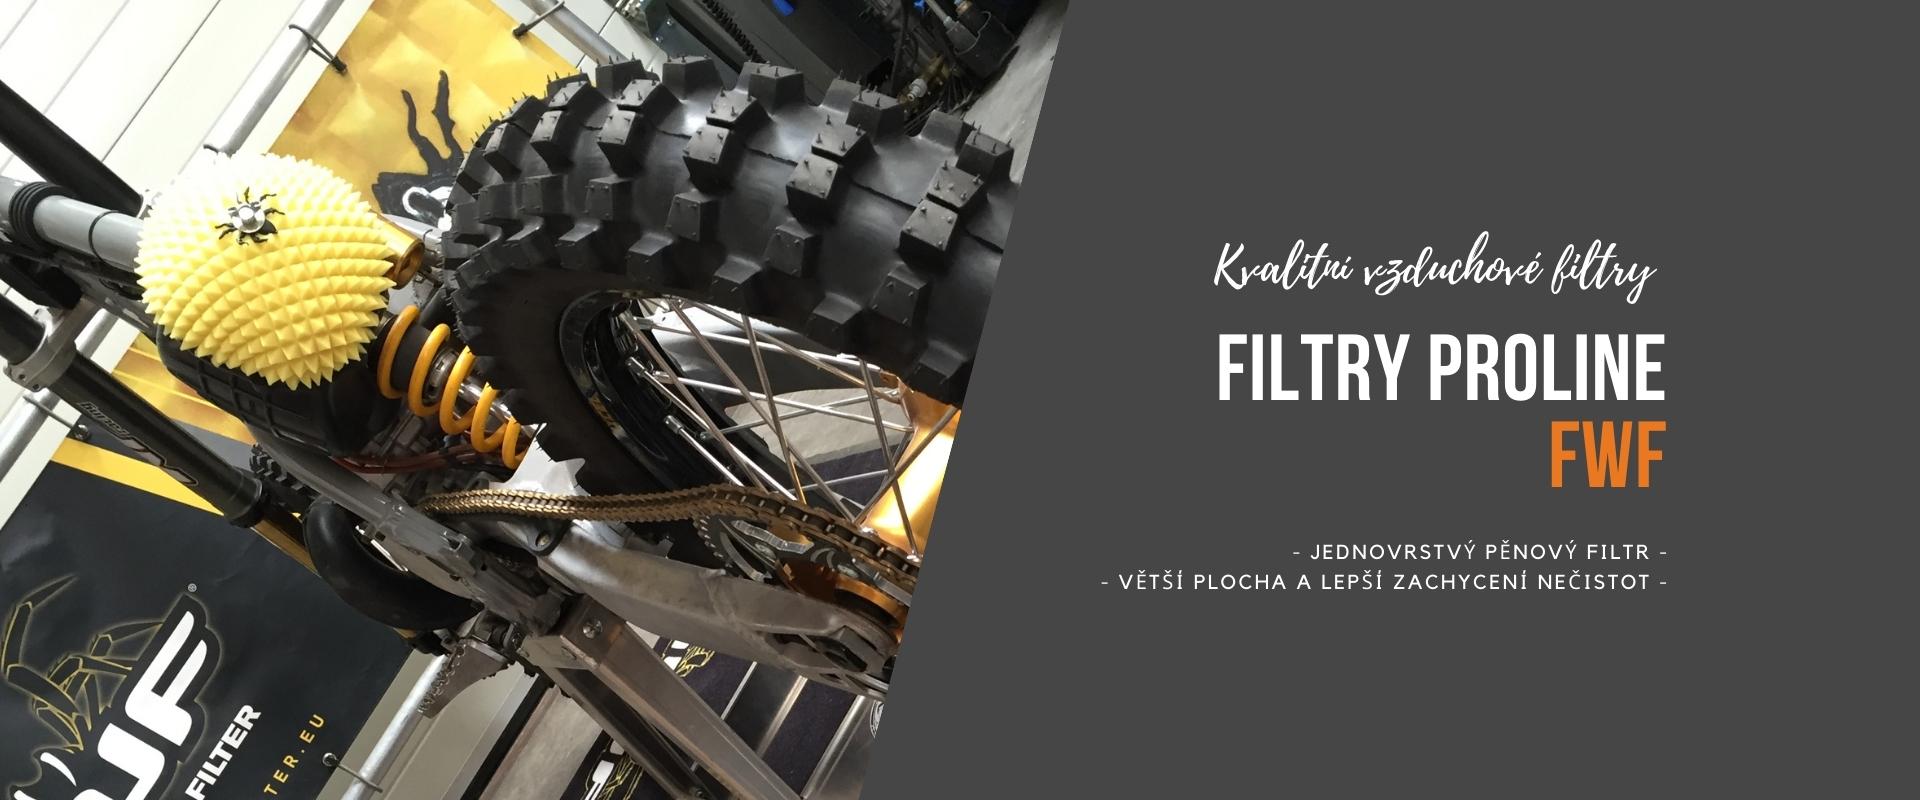 Vzduchové filtry FWF